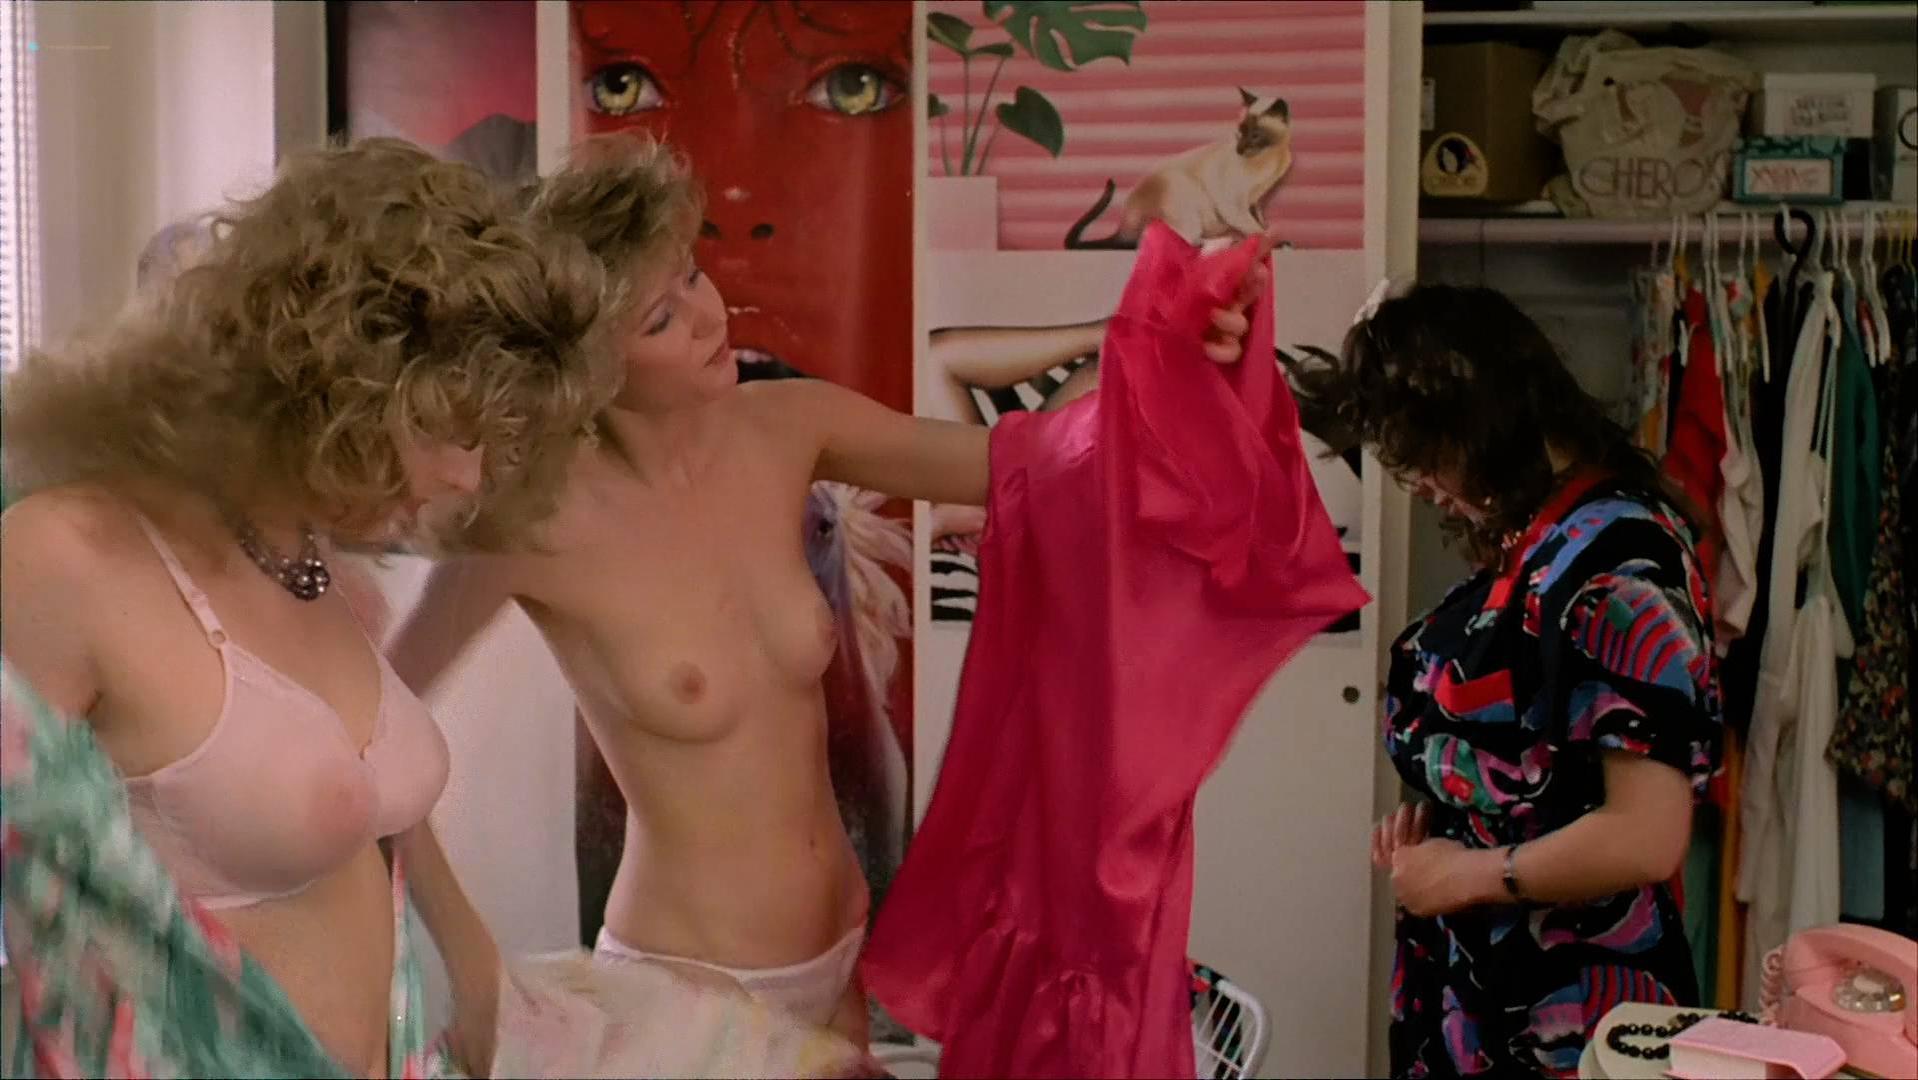 Nude Video Celebs  Nicole Rio Nude, Wendy Martel Nude -6743